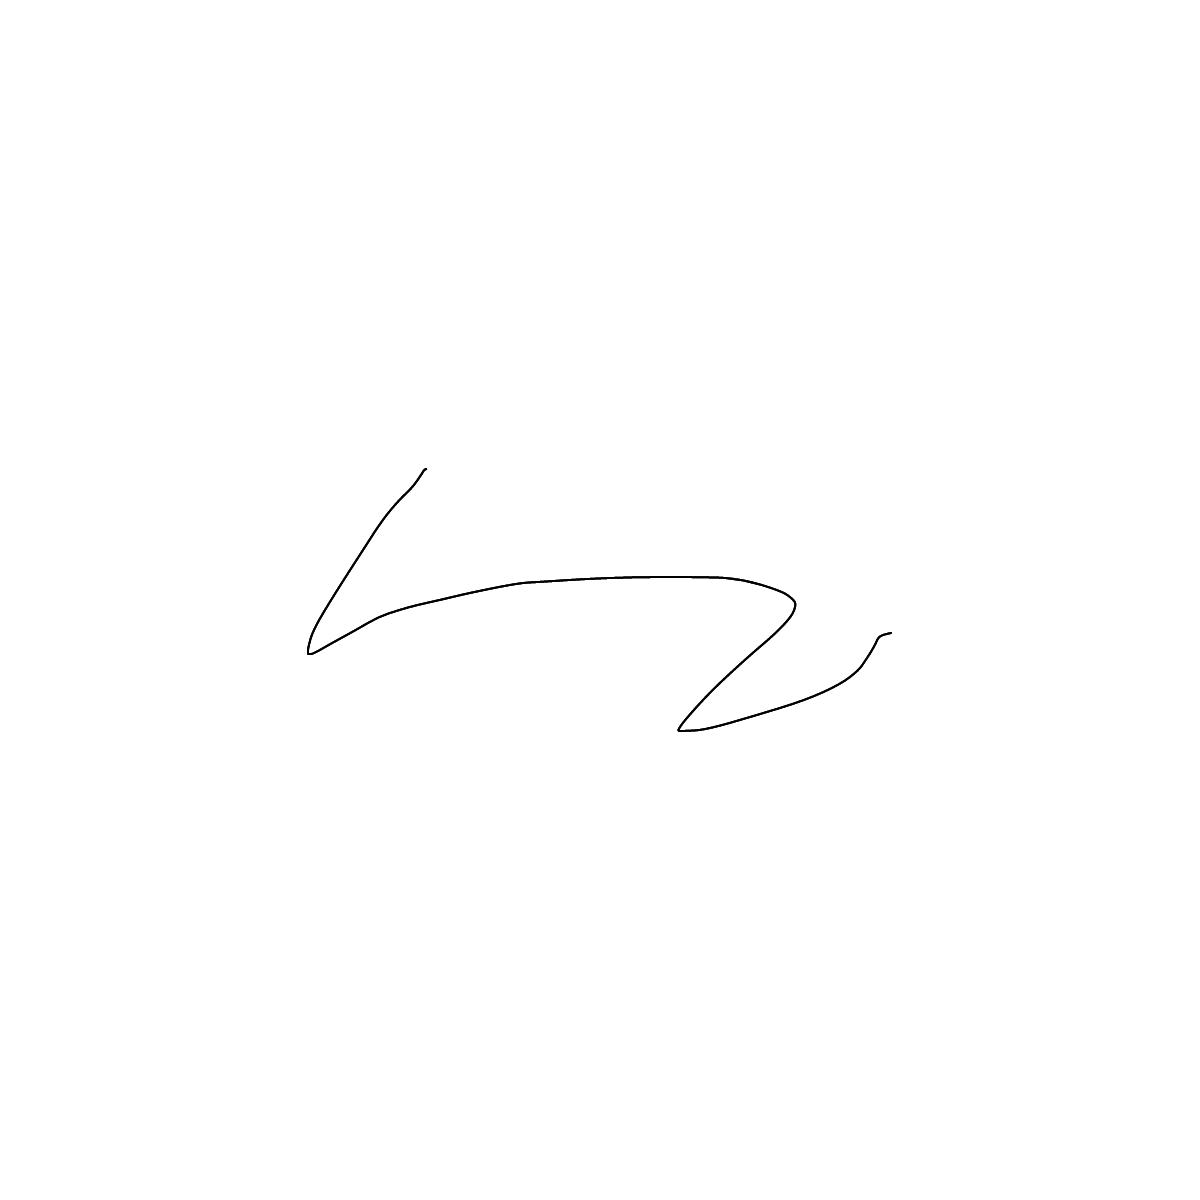 BAAAM drawing#14245 lat:45.3685493469238300lng: -73.5595626831054700